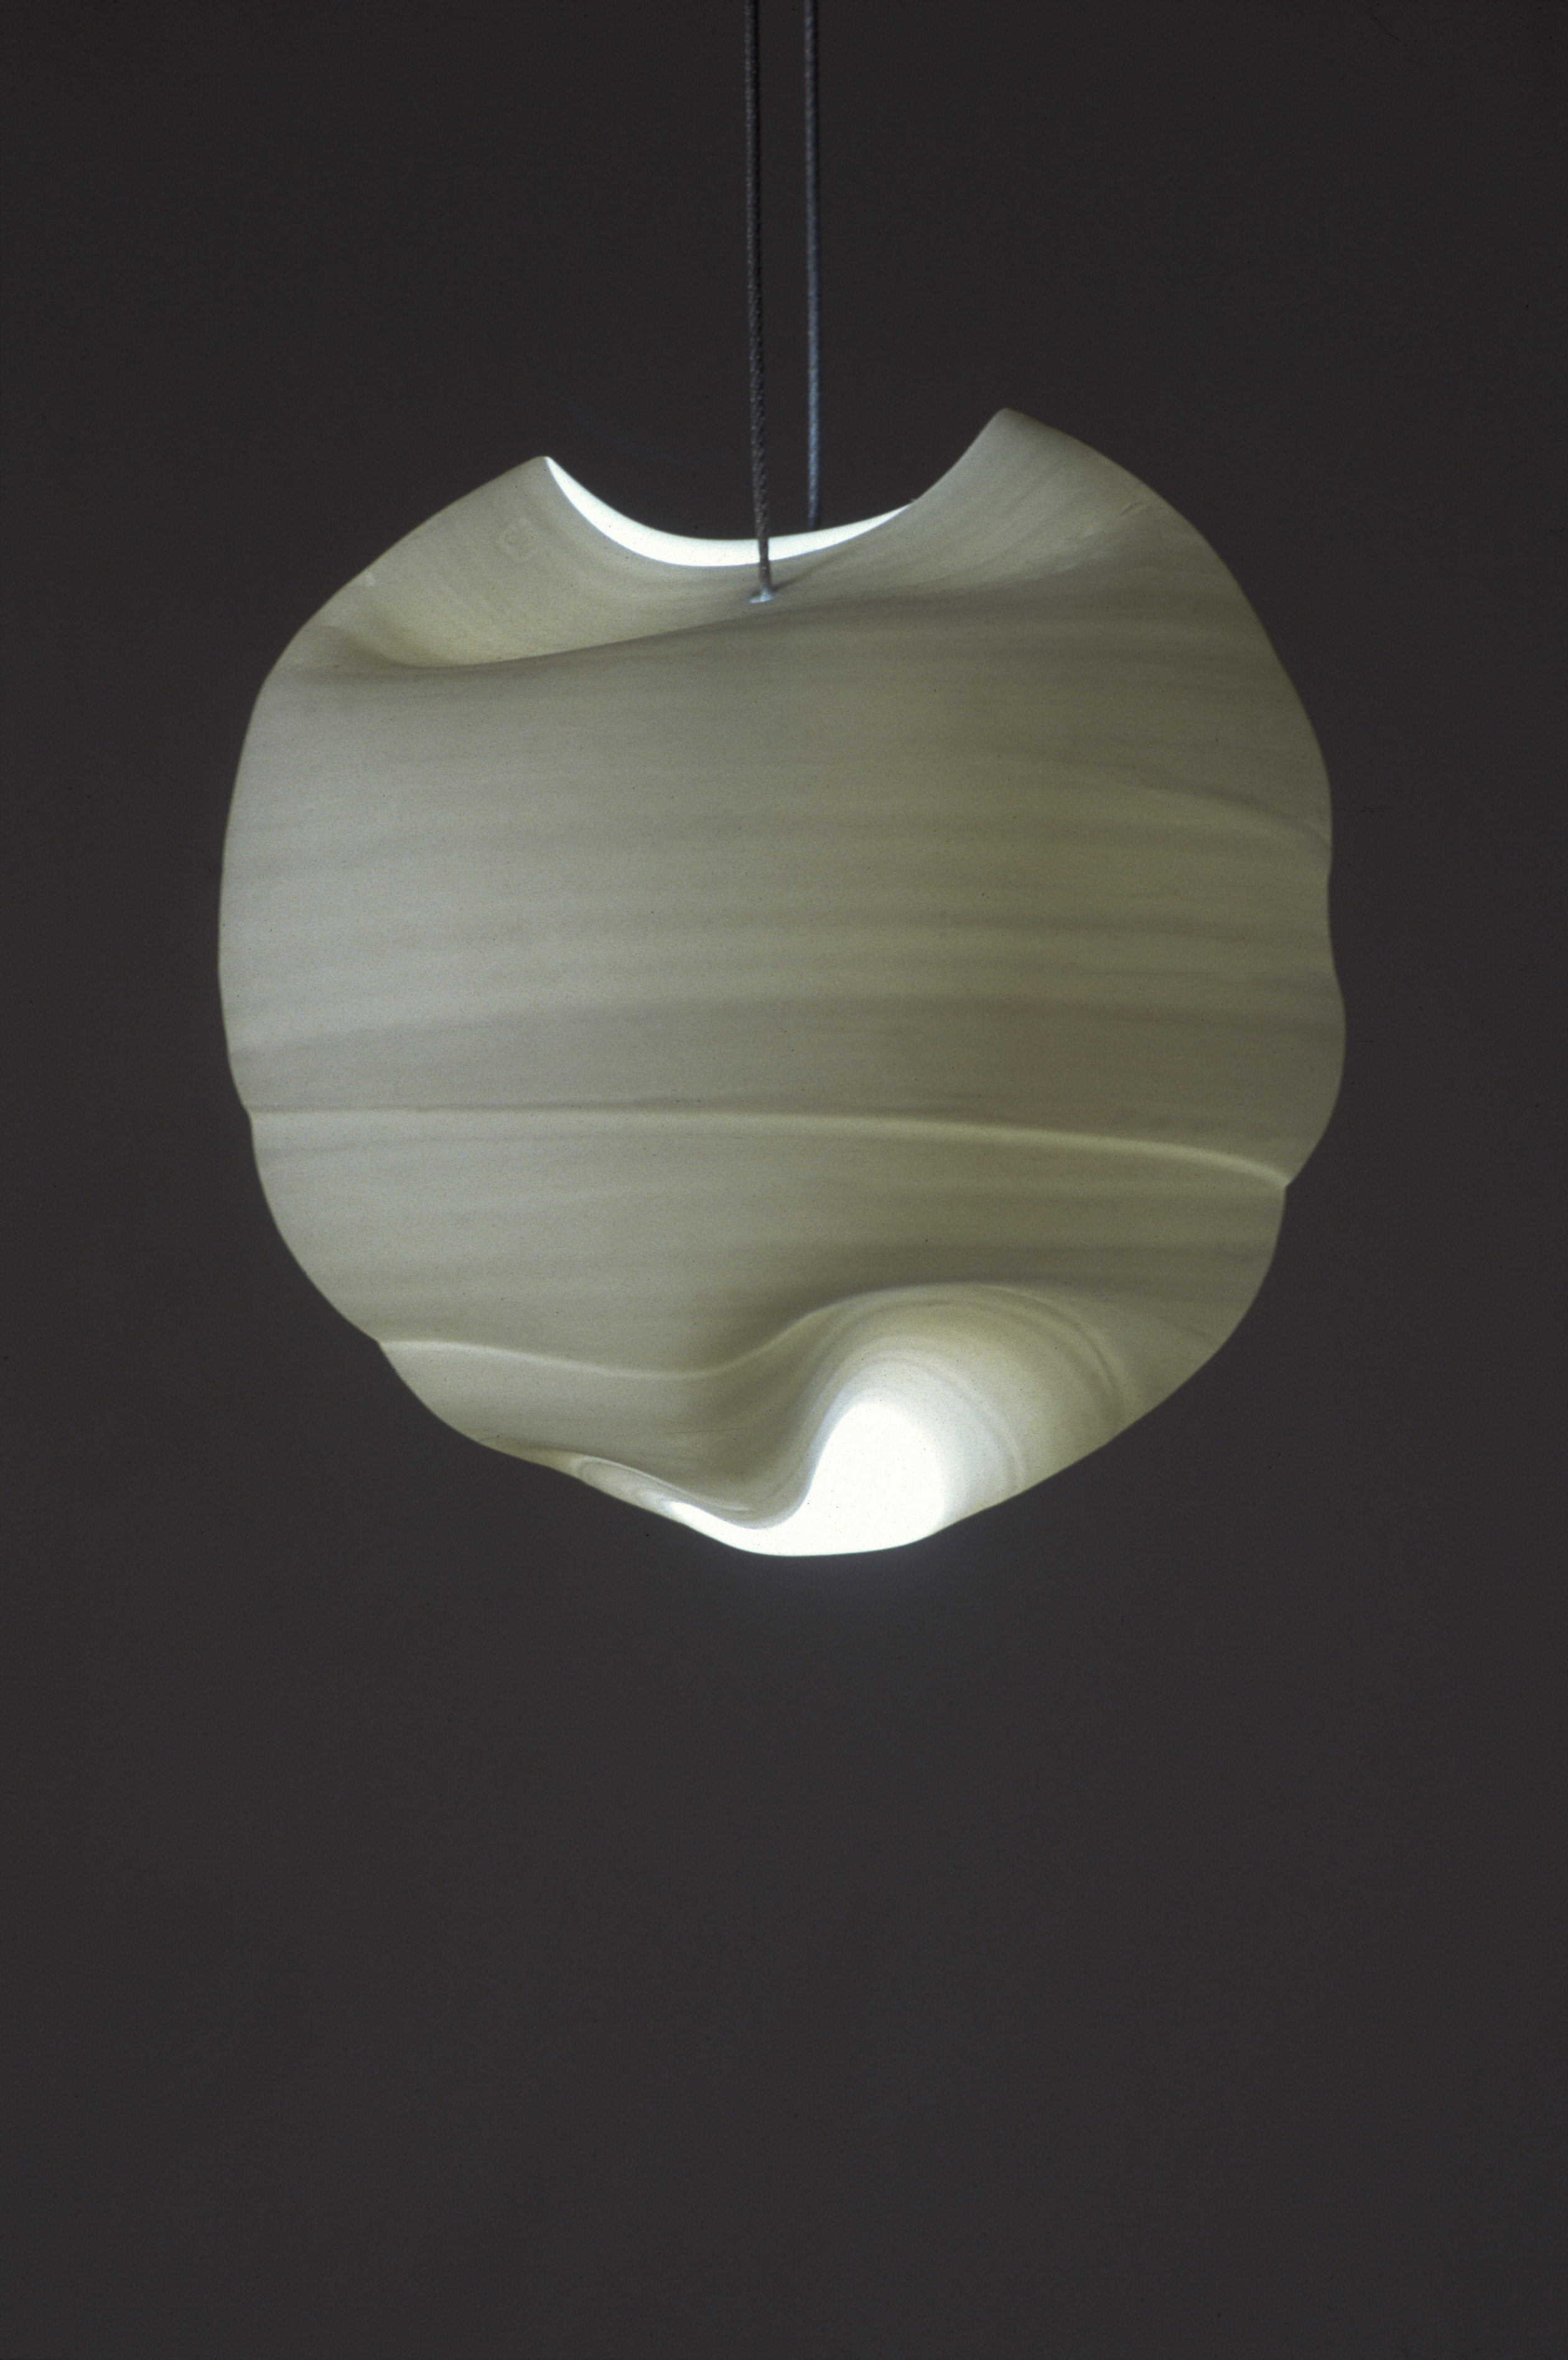 1. Horizontal Pod